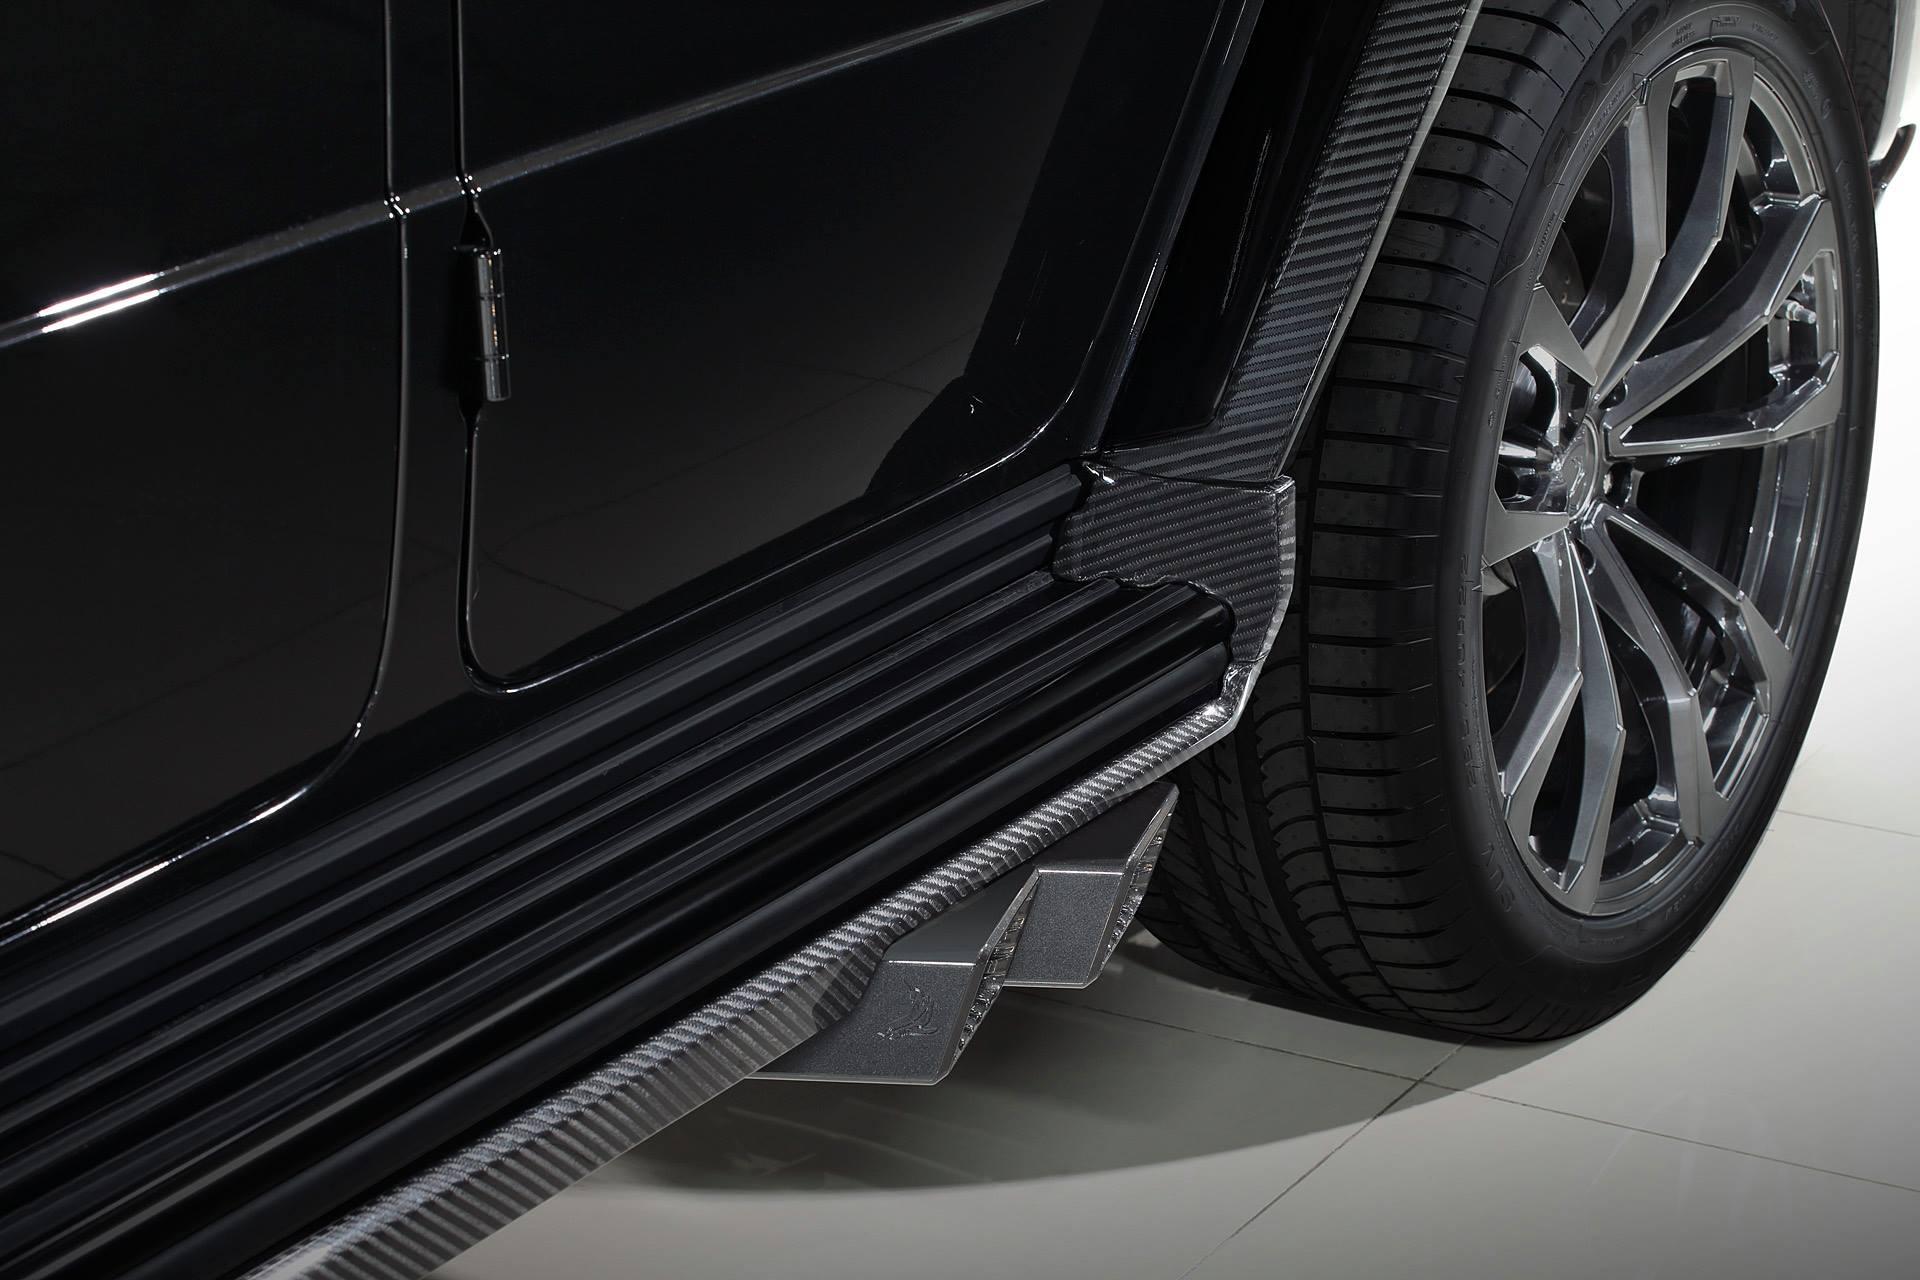 Mercedes G 63 AMG 2019 Topcar terzo body kit